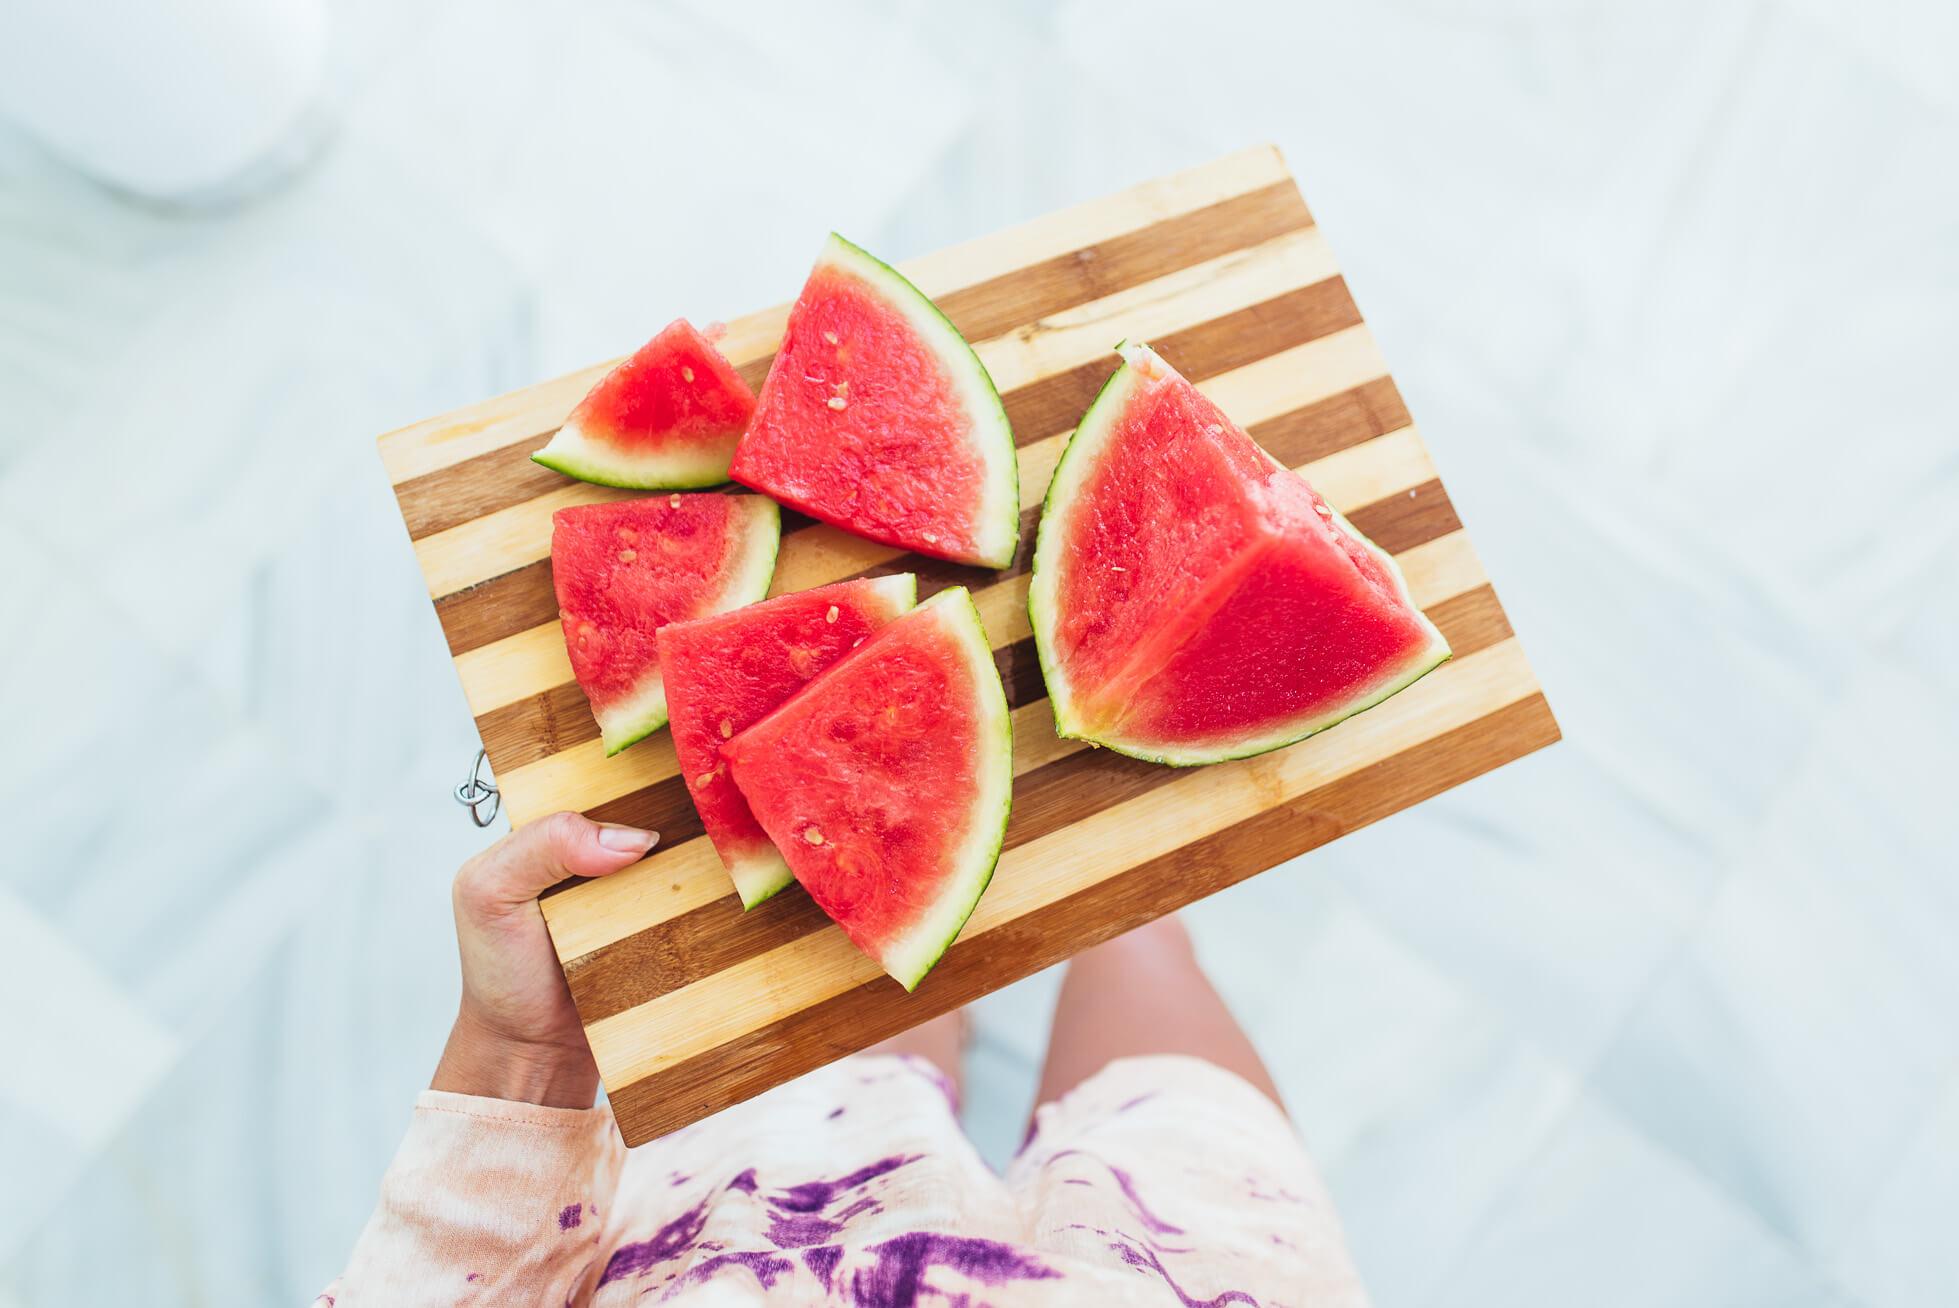 janni-deler-watermelon-snackDSC_8202